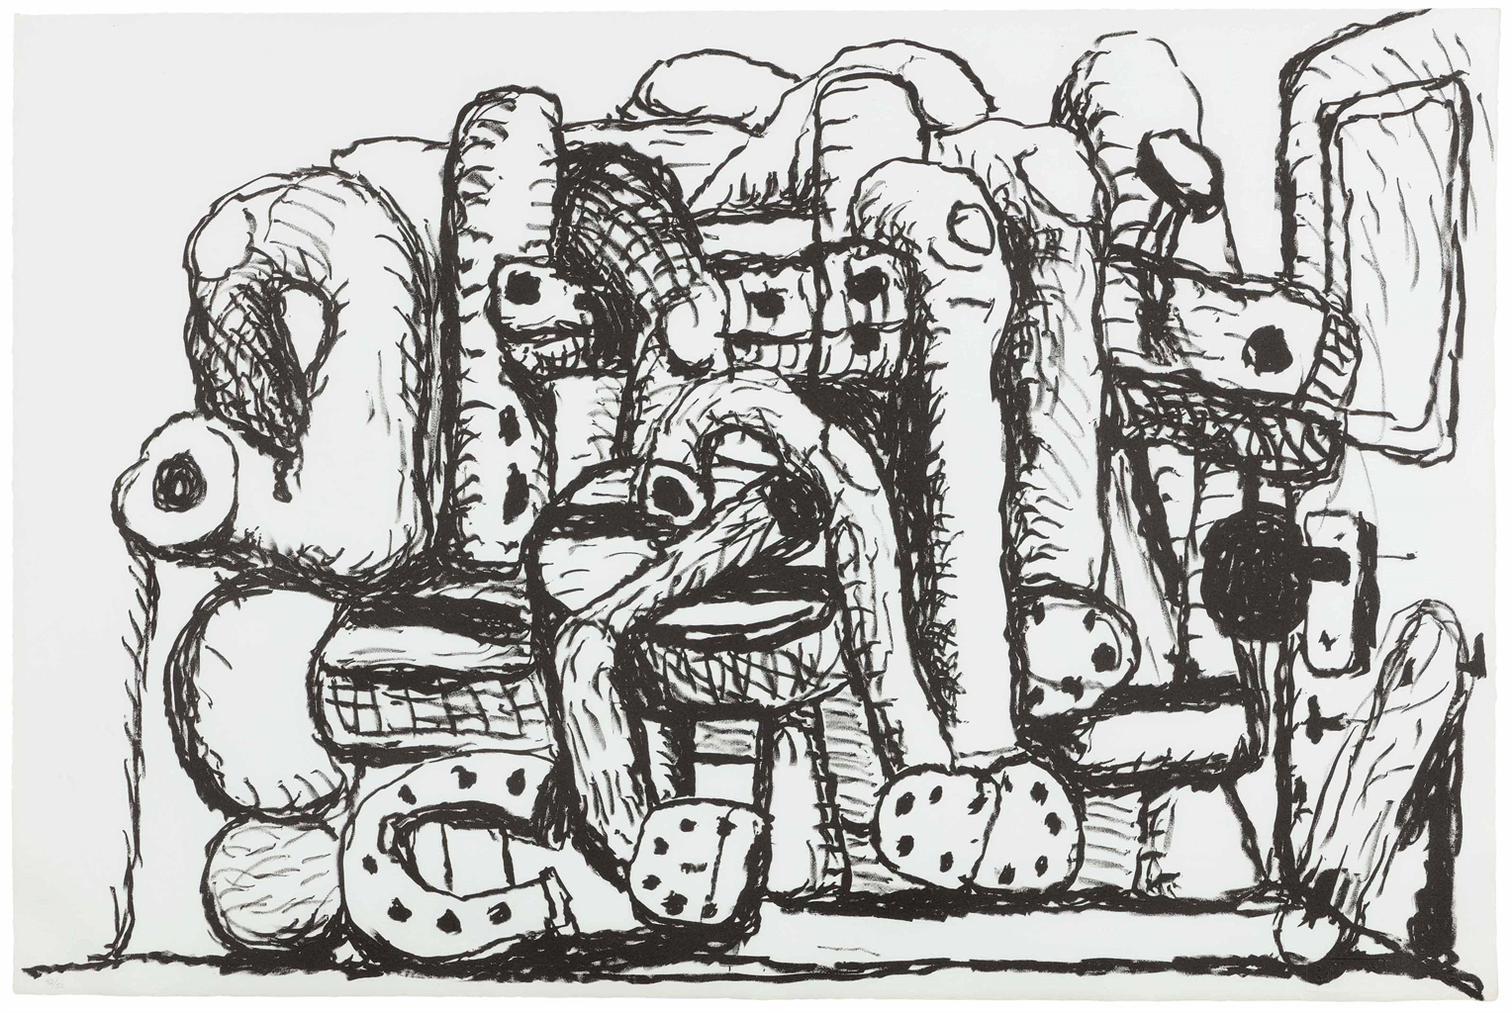 Philip Guston-Pile Up-1980